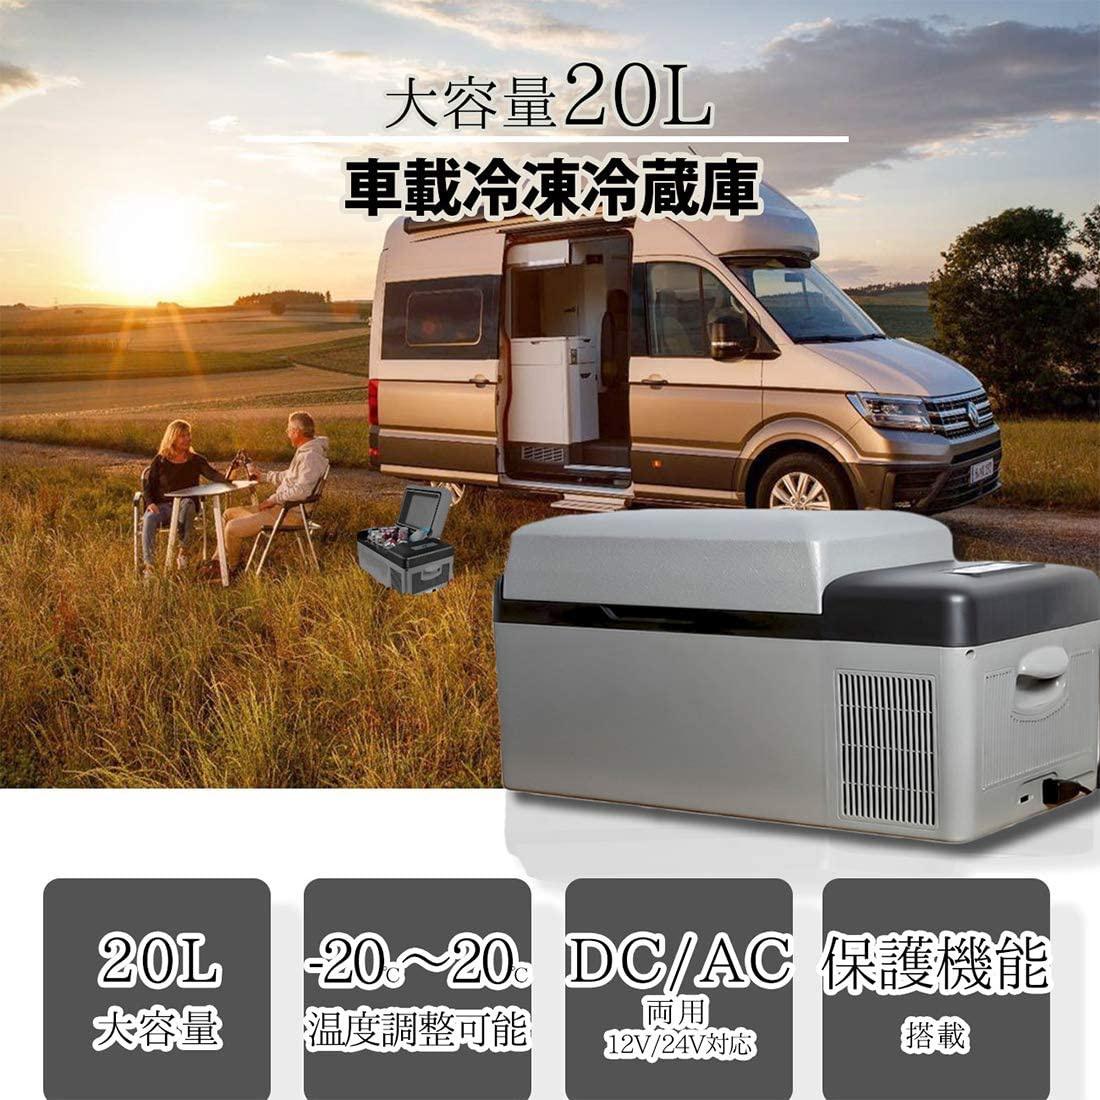 NSS(エヌエスエス) 車載用 冷蔵冷凍庫 STL-C20の商品画像2